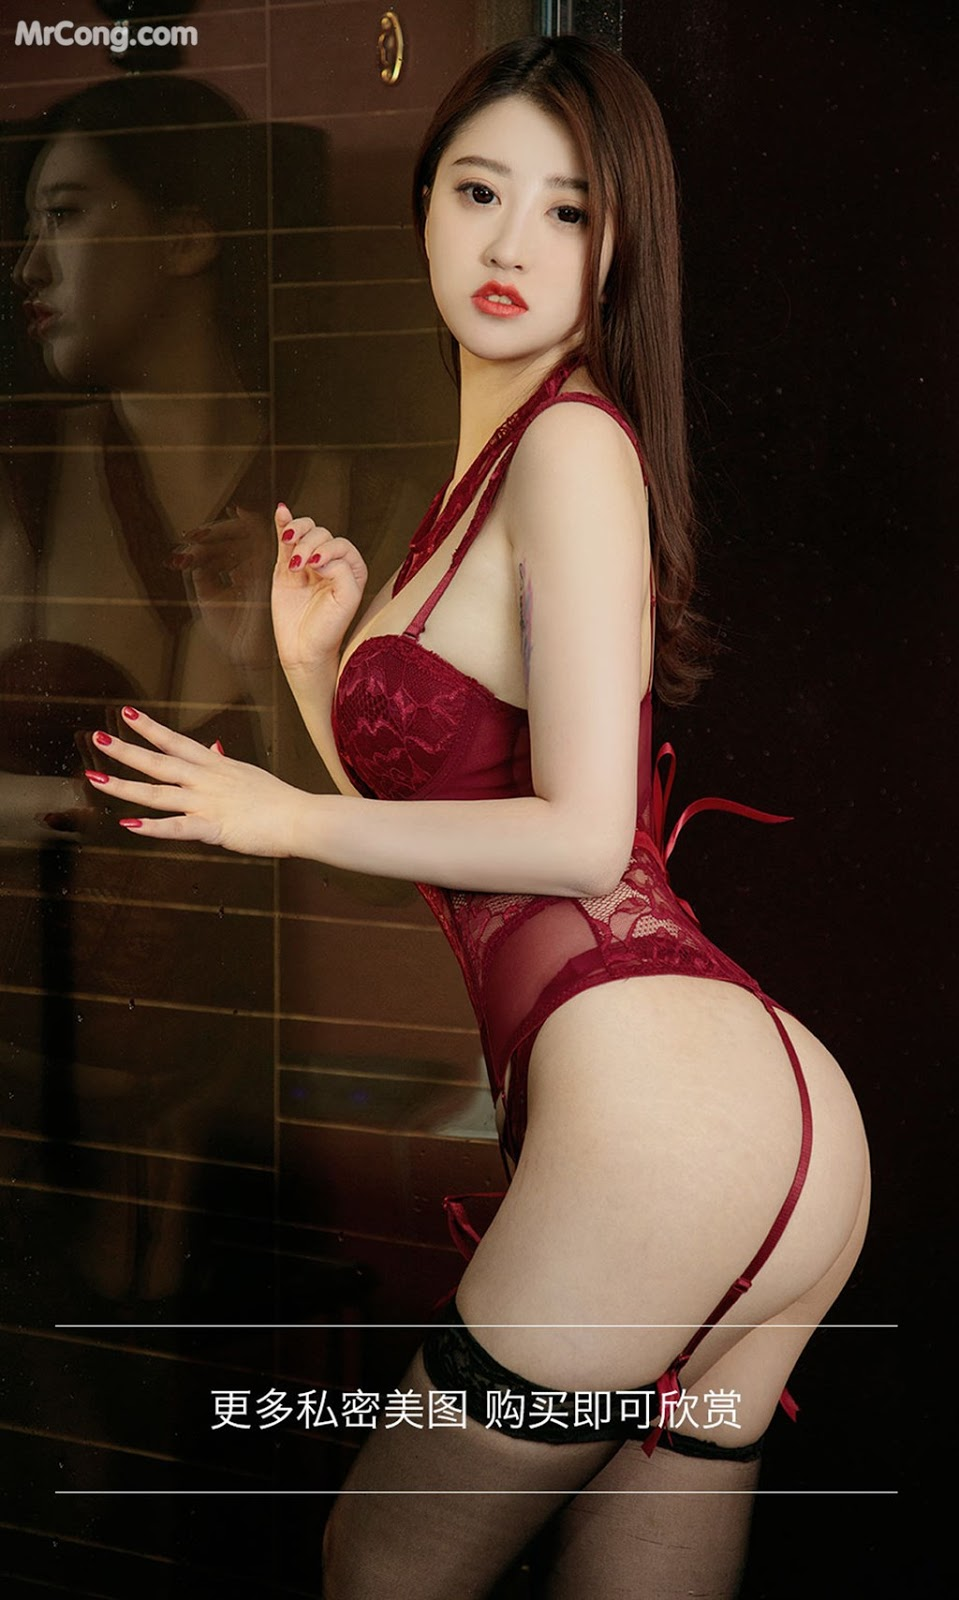 Image UGIRLS-Ai-You-Wu-App-No.964-Ai-Miao-MrCong.com-009 in post UGIRLS – Ai You Wu App No.964: Người mẫu Ai Miao (艾淼) (40 ảnh)